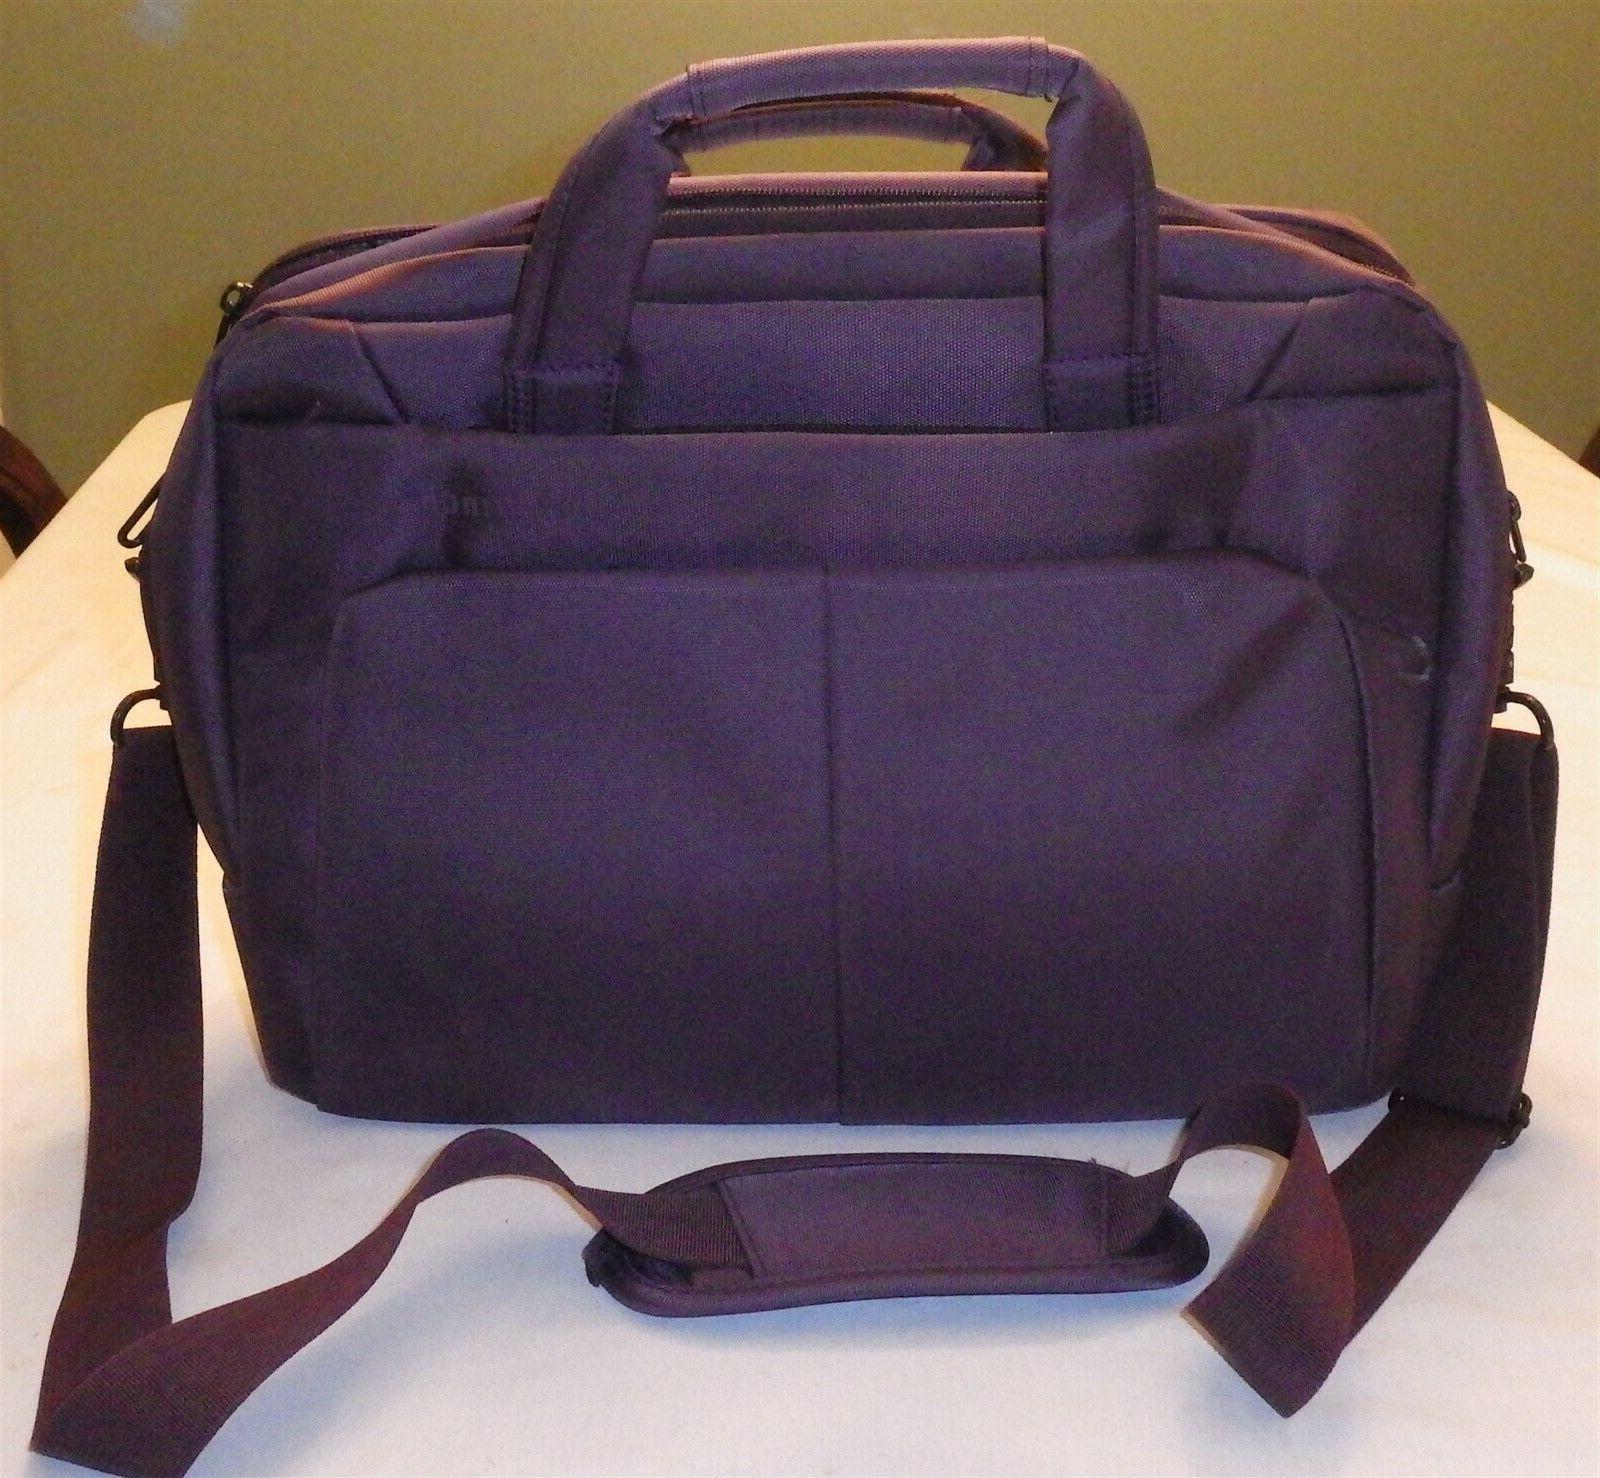 new 15 6 plum padded sleeve case